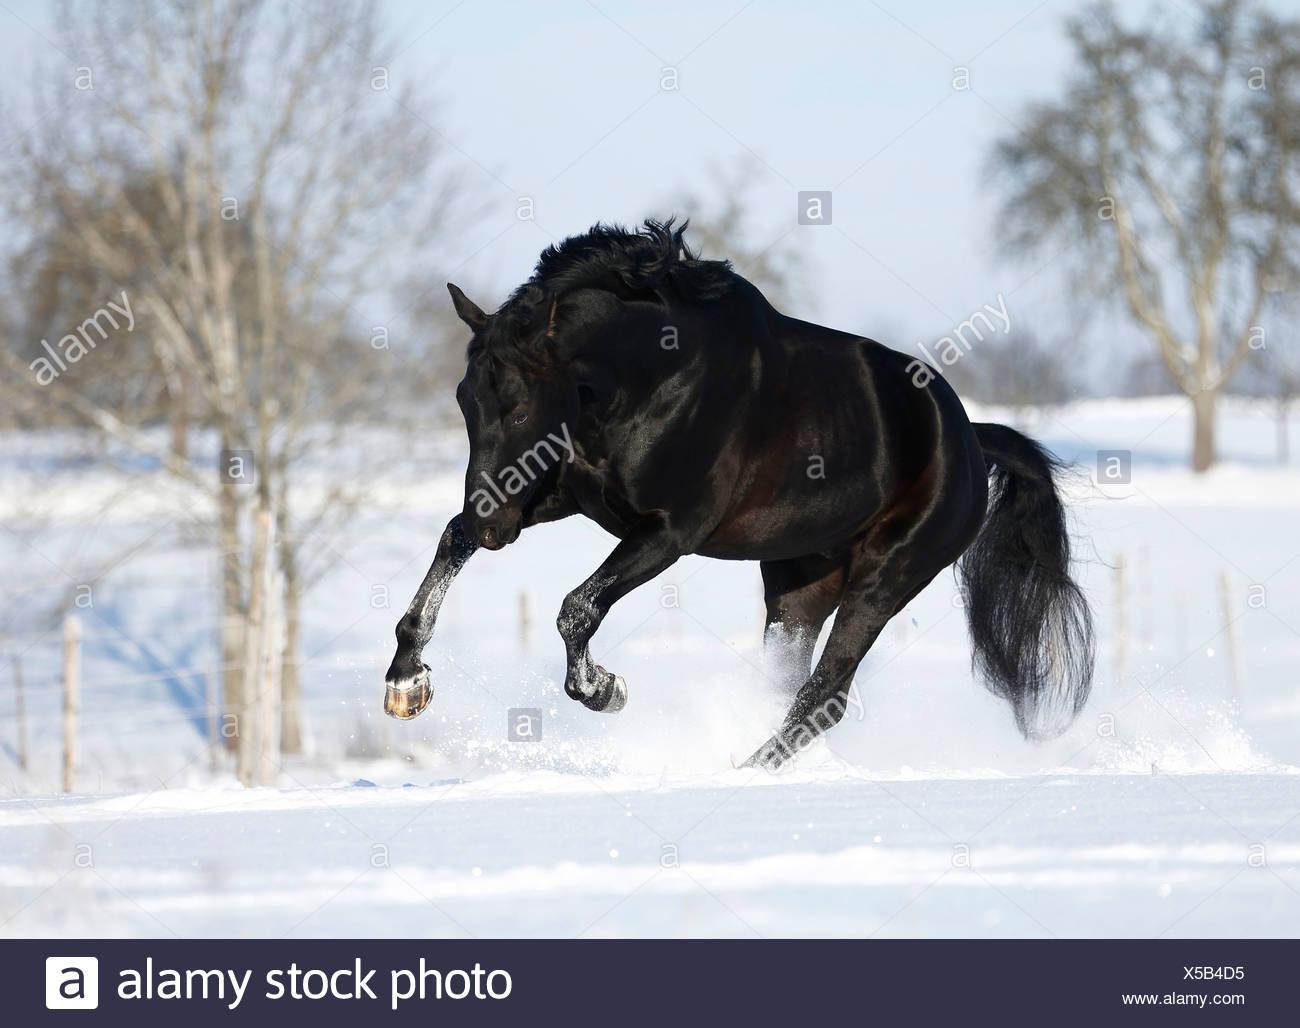 Germany Baden Wuerttemberg Black Horse Running In Snow Stock Photo Alamy